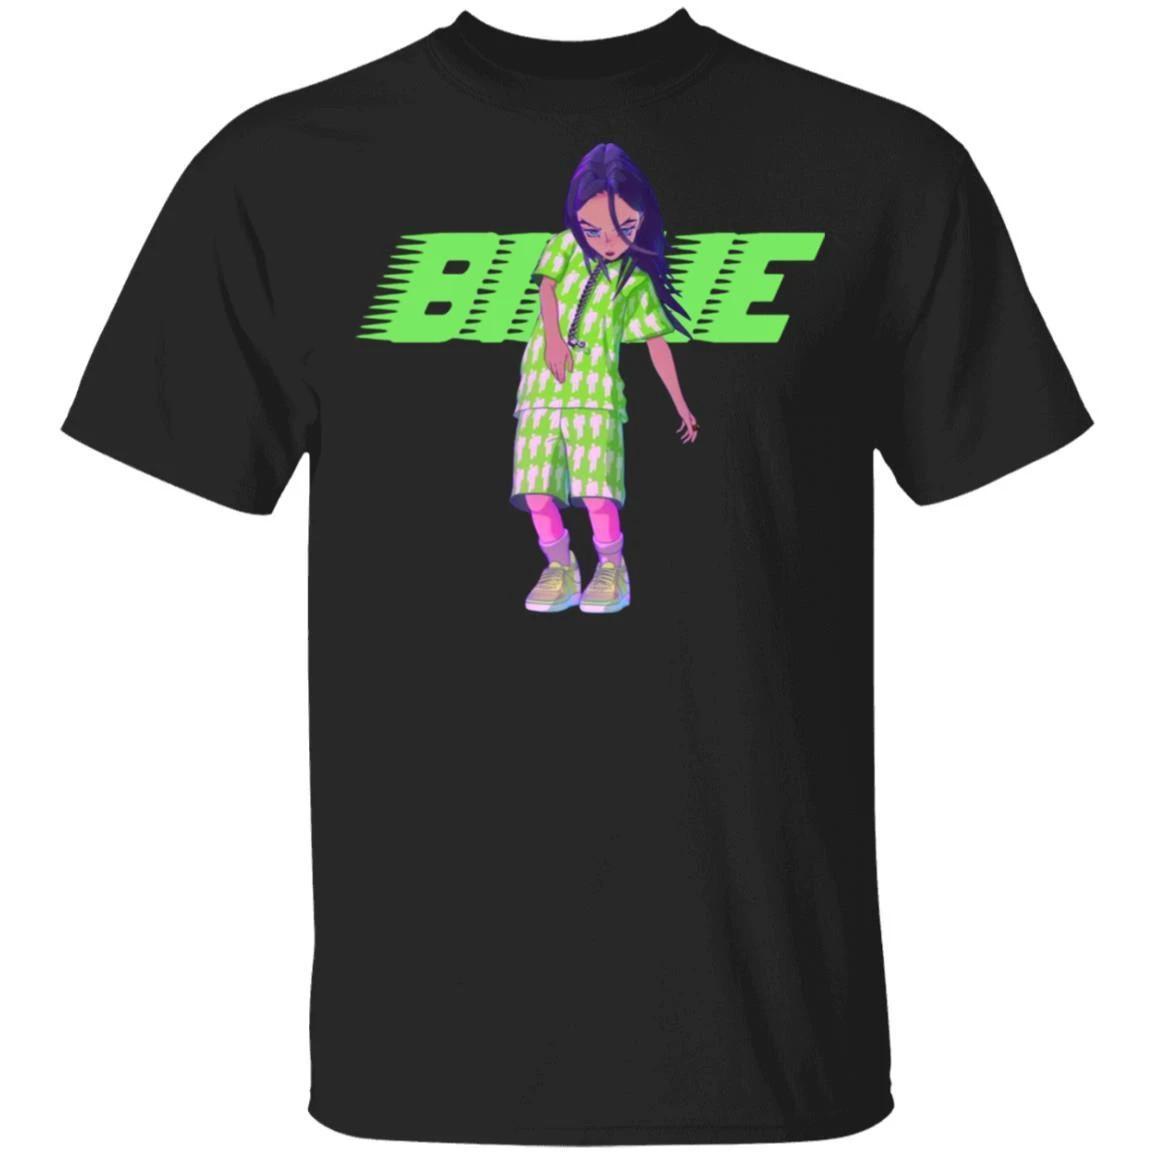 Billie Eillish Signature Dance Move T-shirt